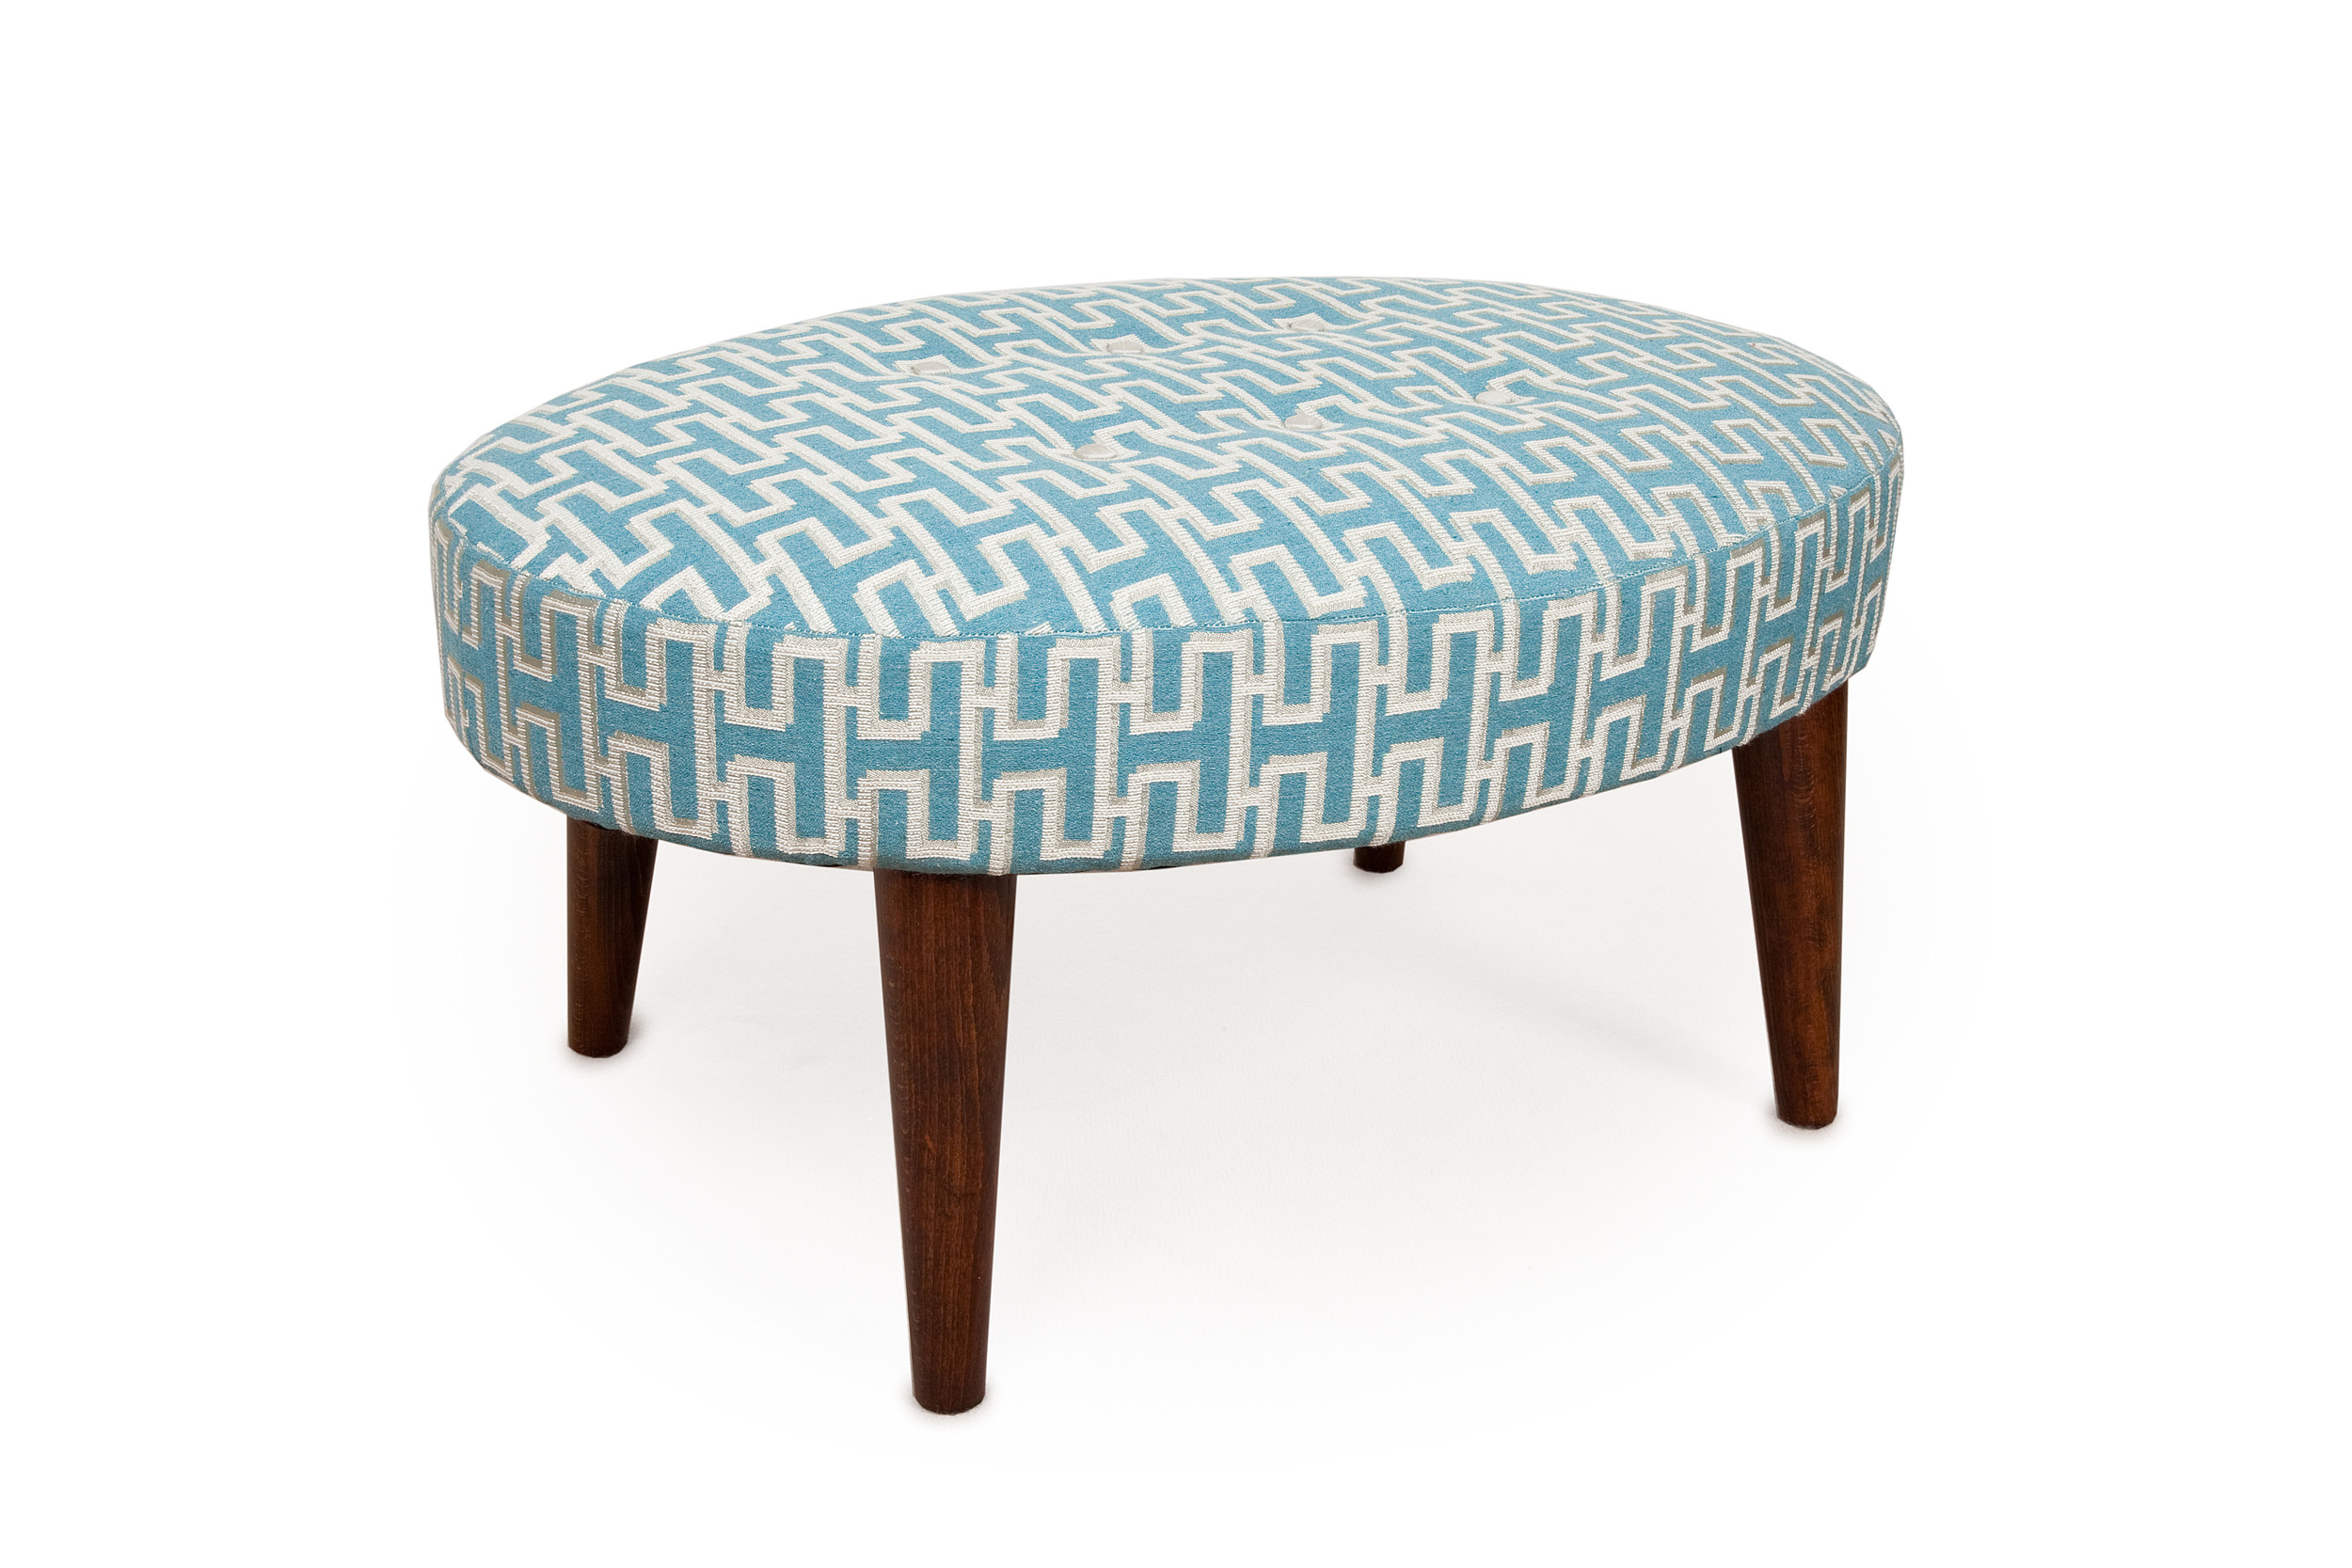 Small oval Stool £295 + fabric